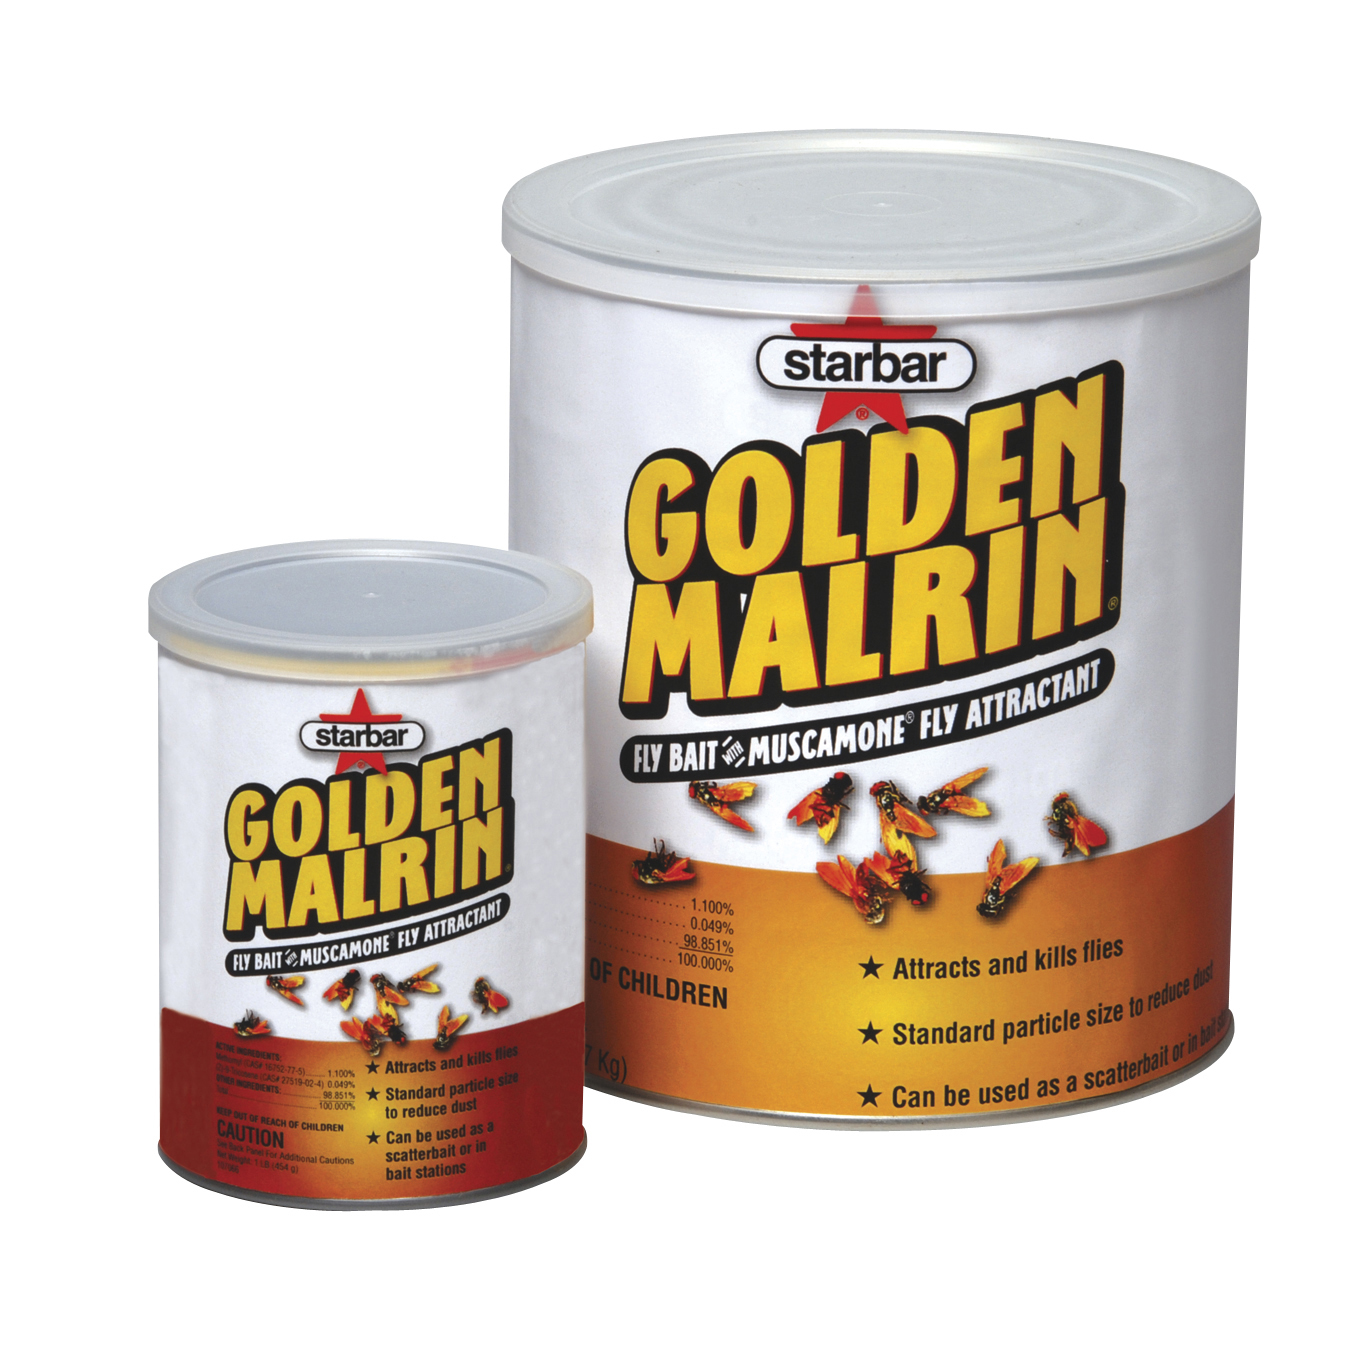 STARBAR Golden Malrin Fly Bait